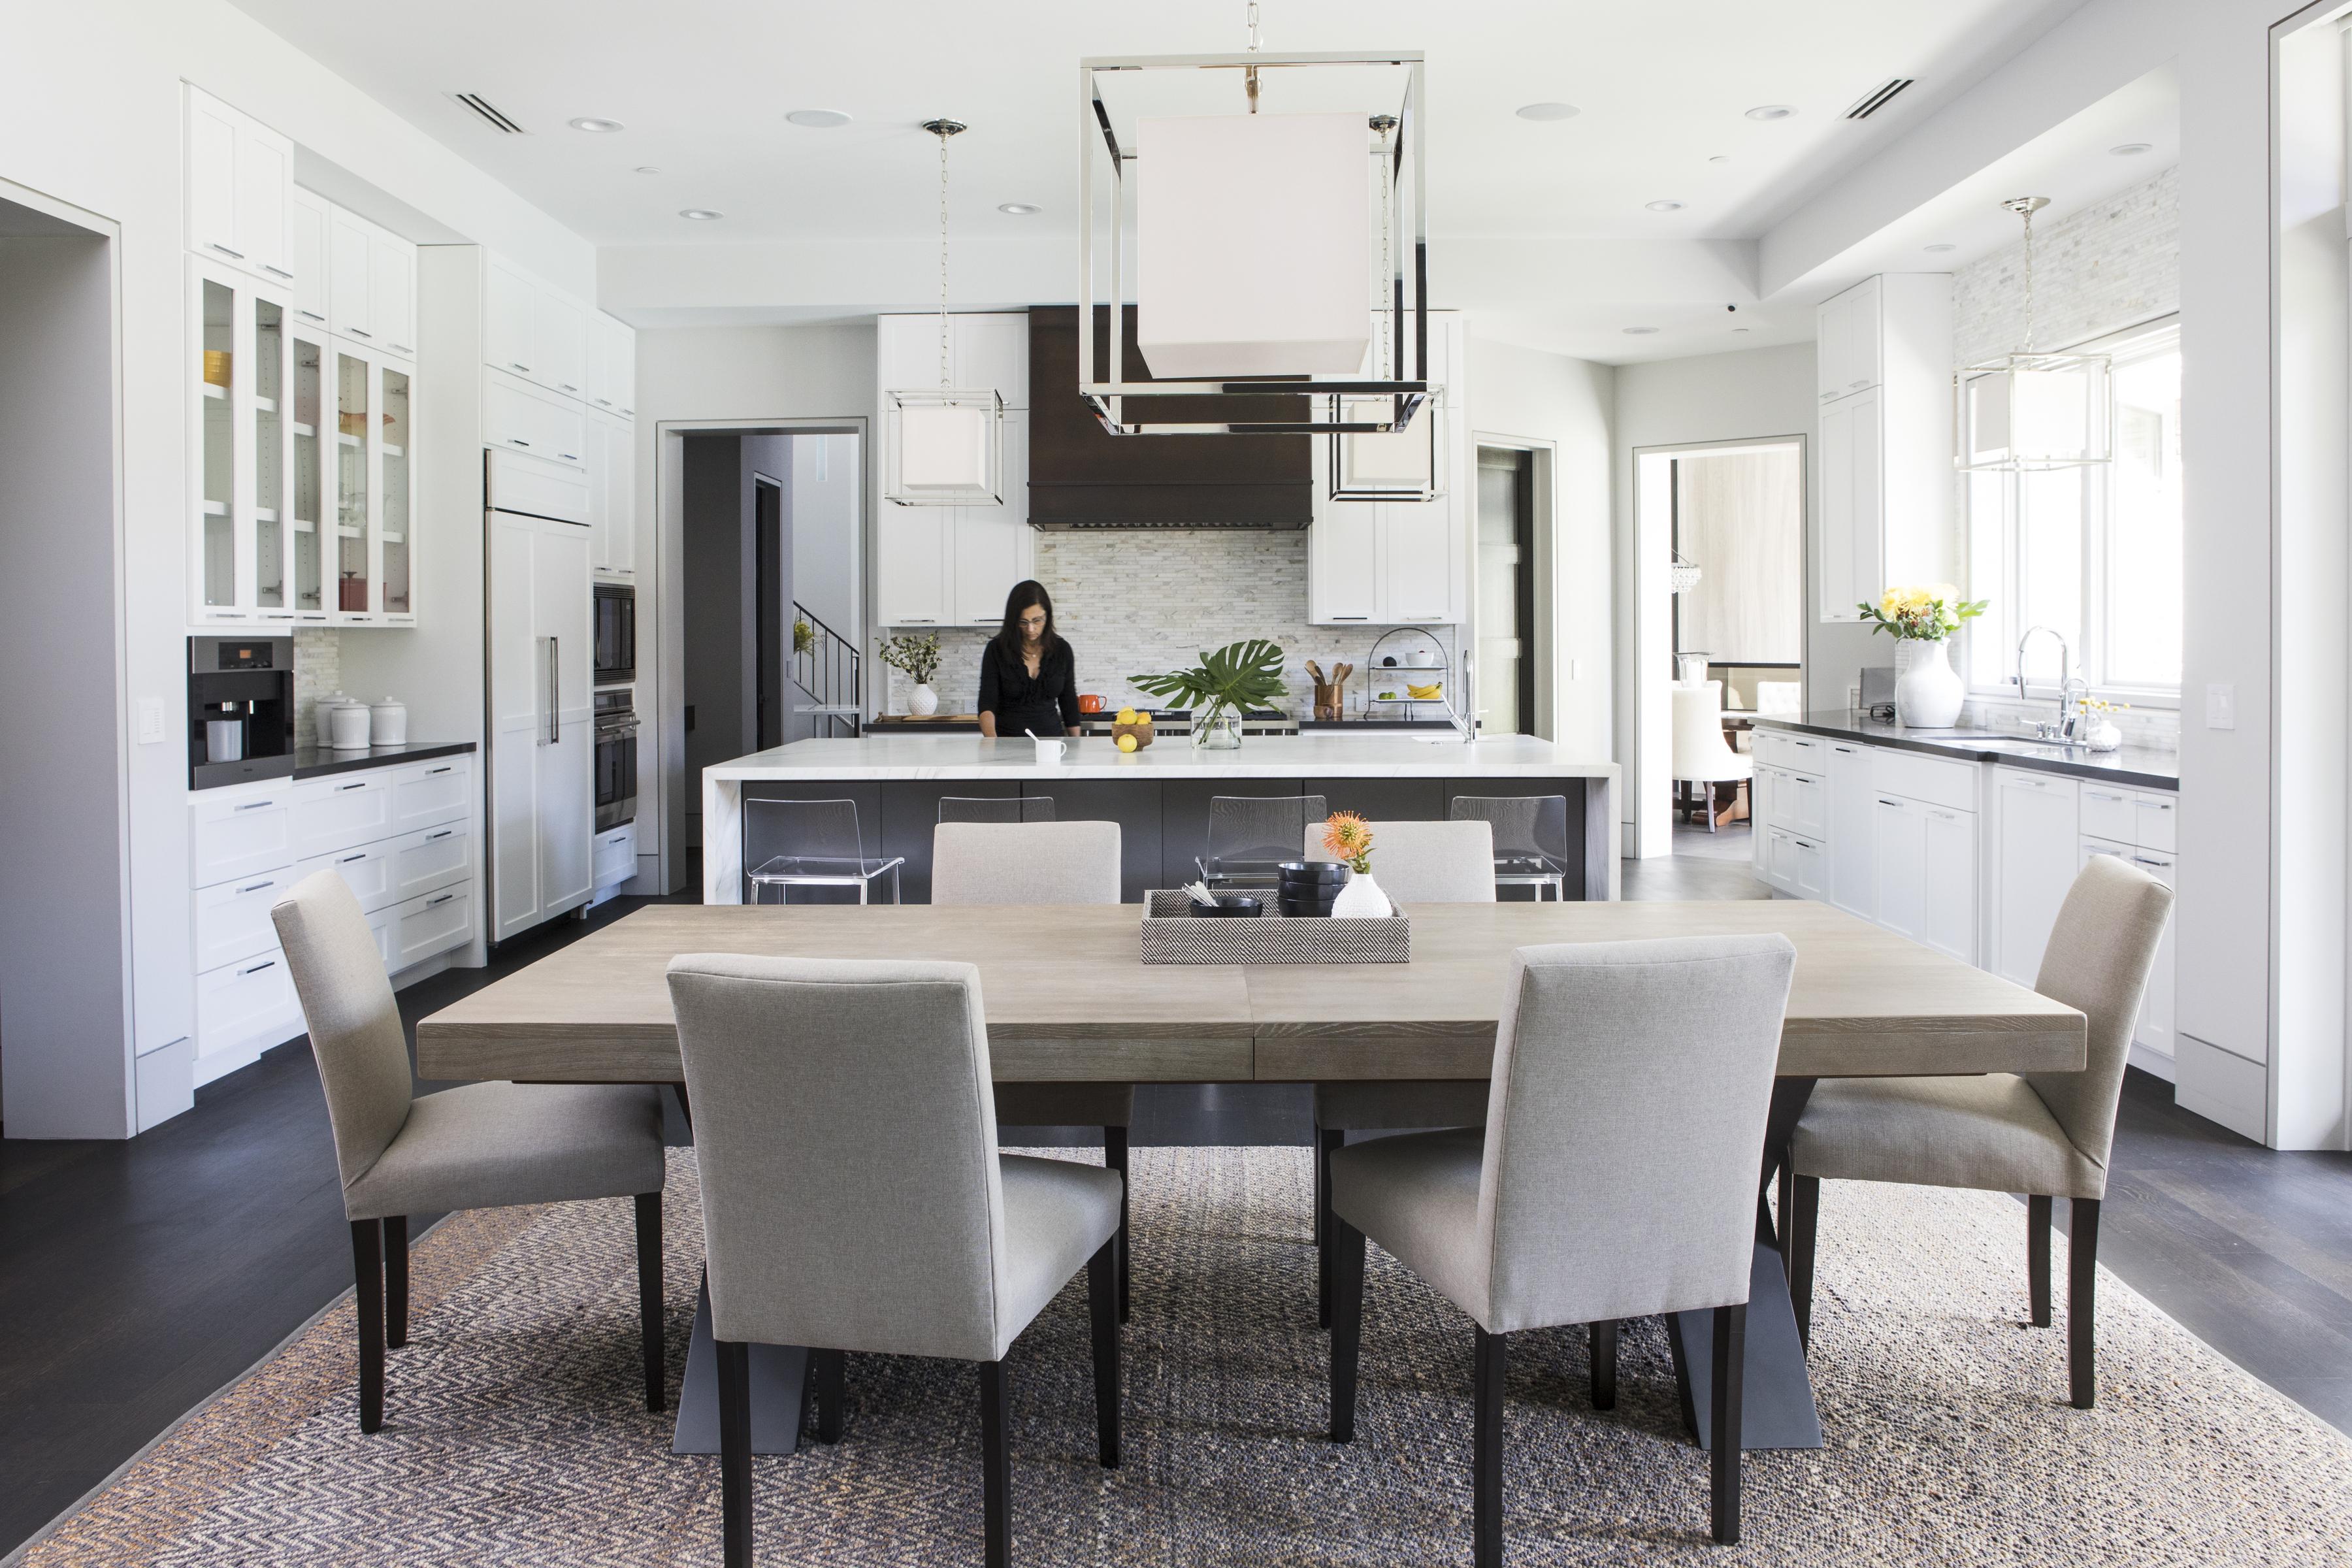 Interior designer bay area ca home plan for Interior design jobs in california